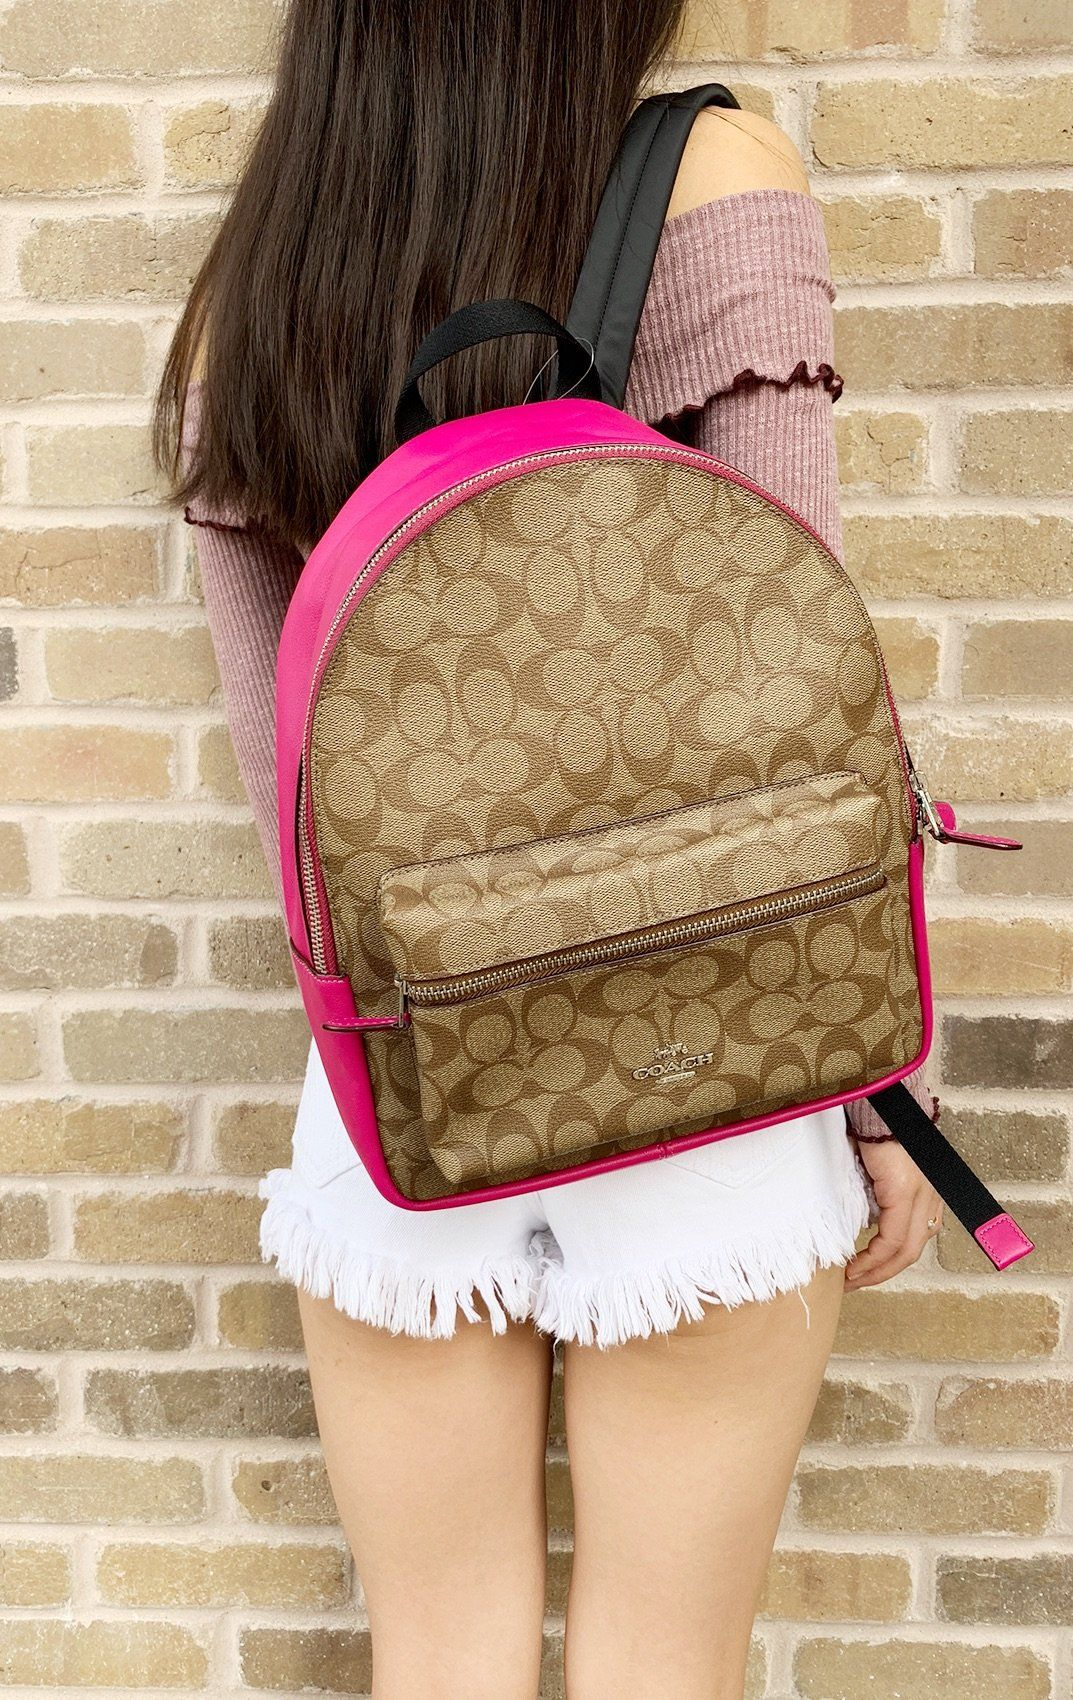 4701dddab99 Coach Medium Charlie Backapck Khaki Signature Pink Cerise F39510  Poshmark   toprated  amazonfashion  tradesyseller  Handbags  poshpackages  rated   GabysBags ...